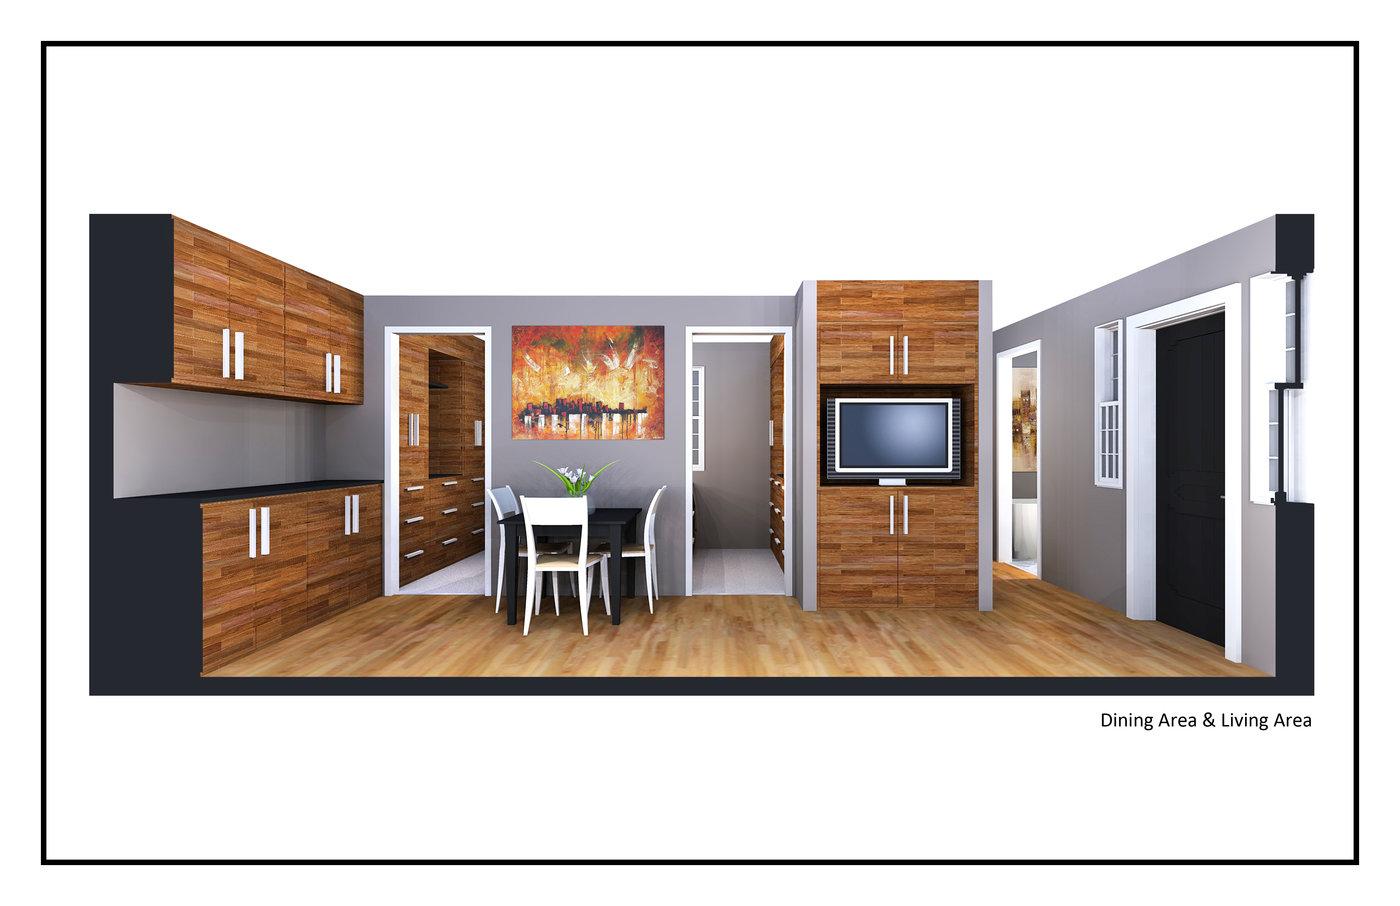 400 Square Foot House by Jordan Parke at Coroflotcom